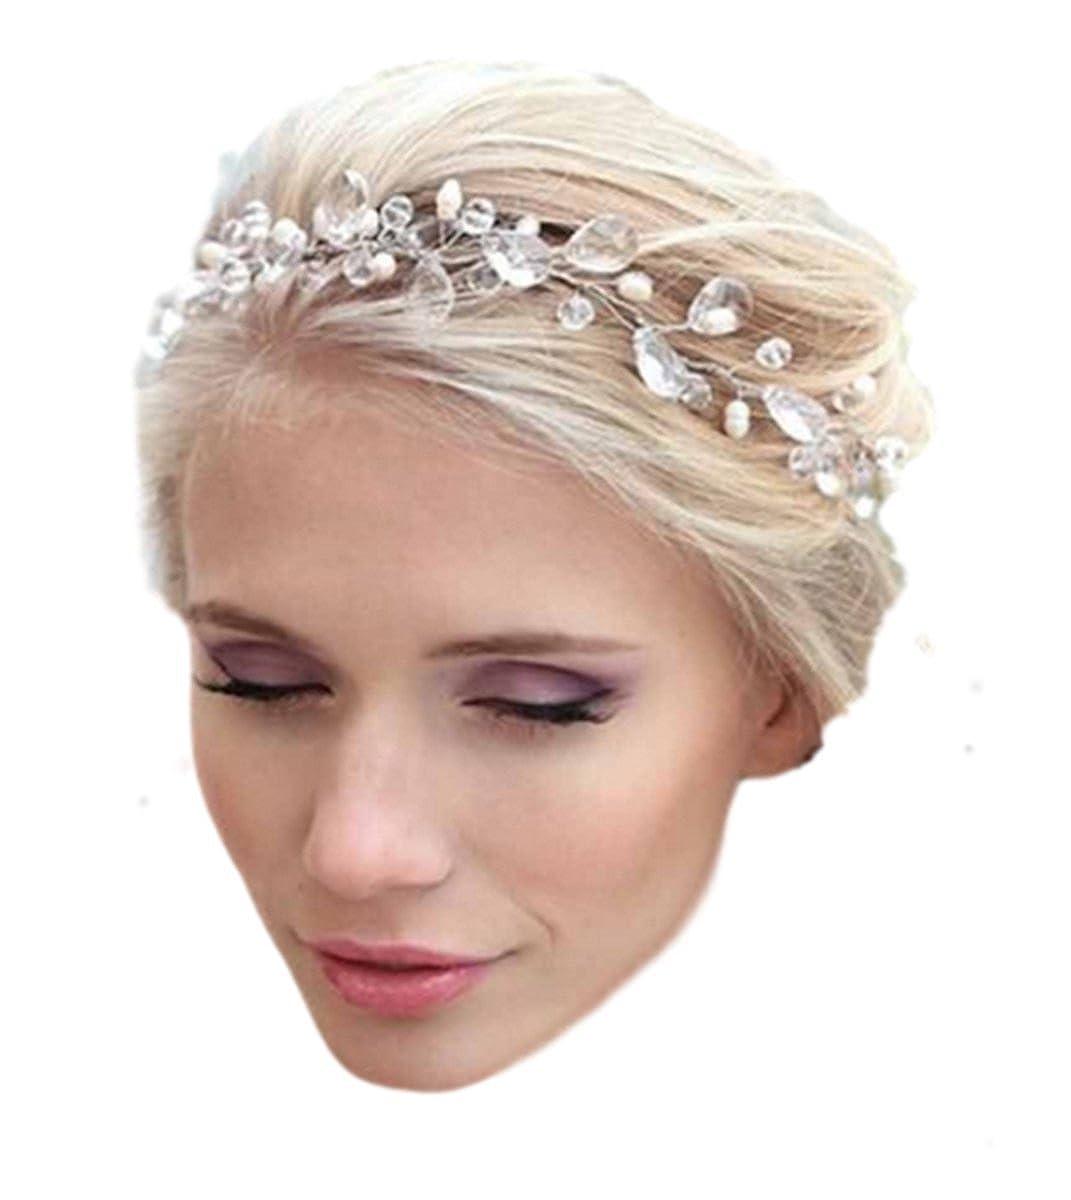 Damen Haarschmuck Haarband Haarreif Haarbänder Haardeko Kristallen Hochzeit Braut Kristall Perlen Edel Edelschmuck Schmuck Accessoires Fashion Jewery HGZ-0293